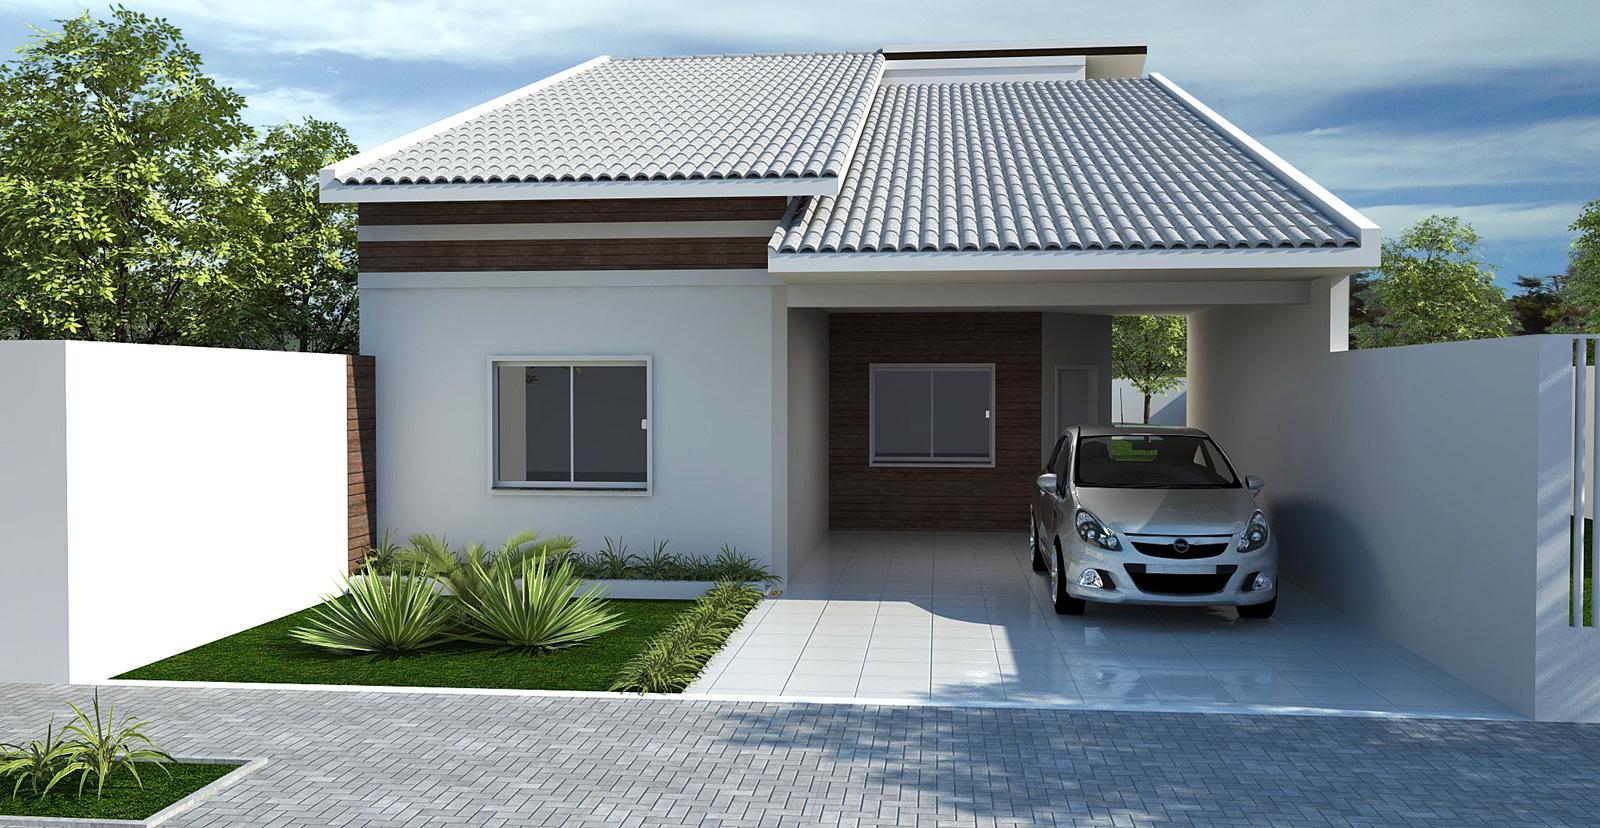 Casas lindas e baratas